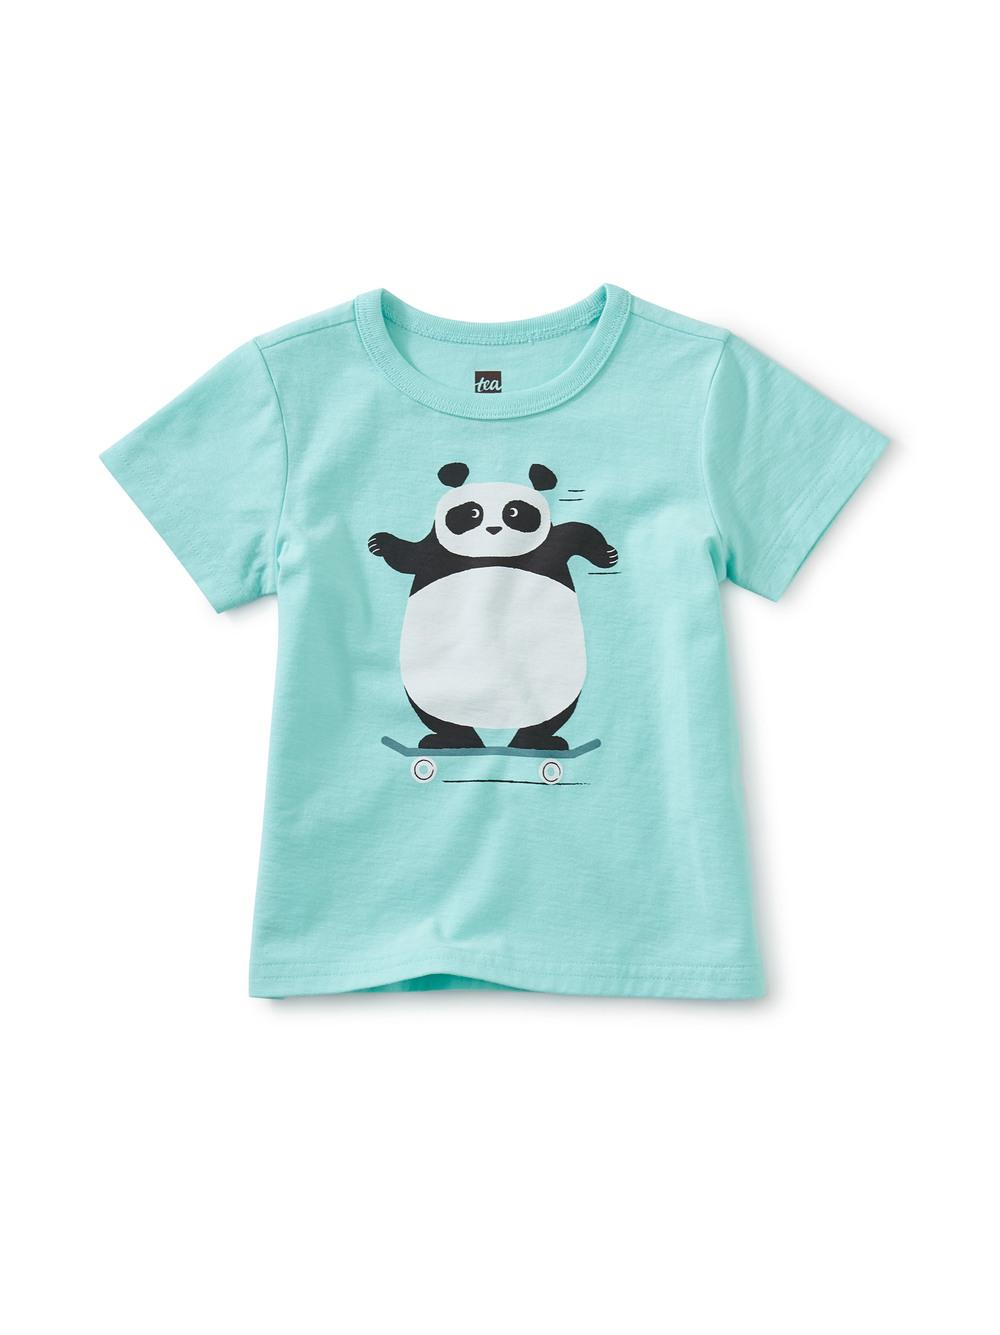 Skating Panda Graphic Tee